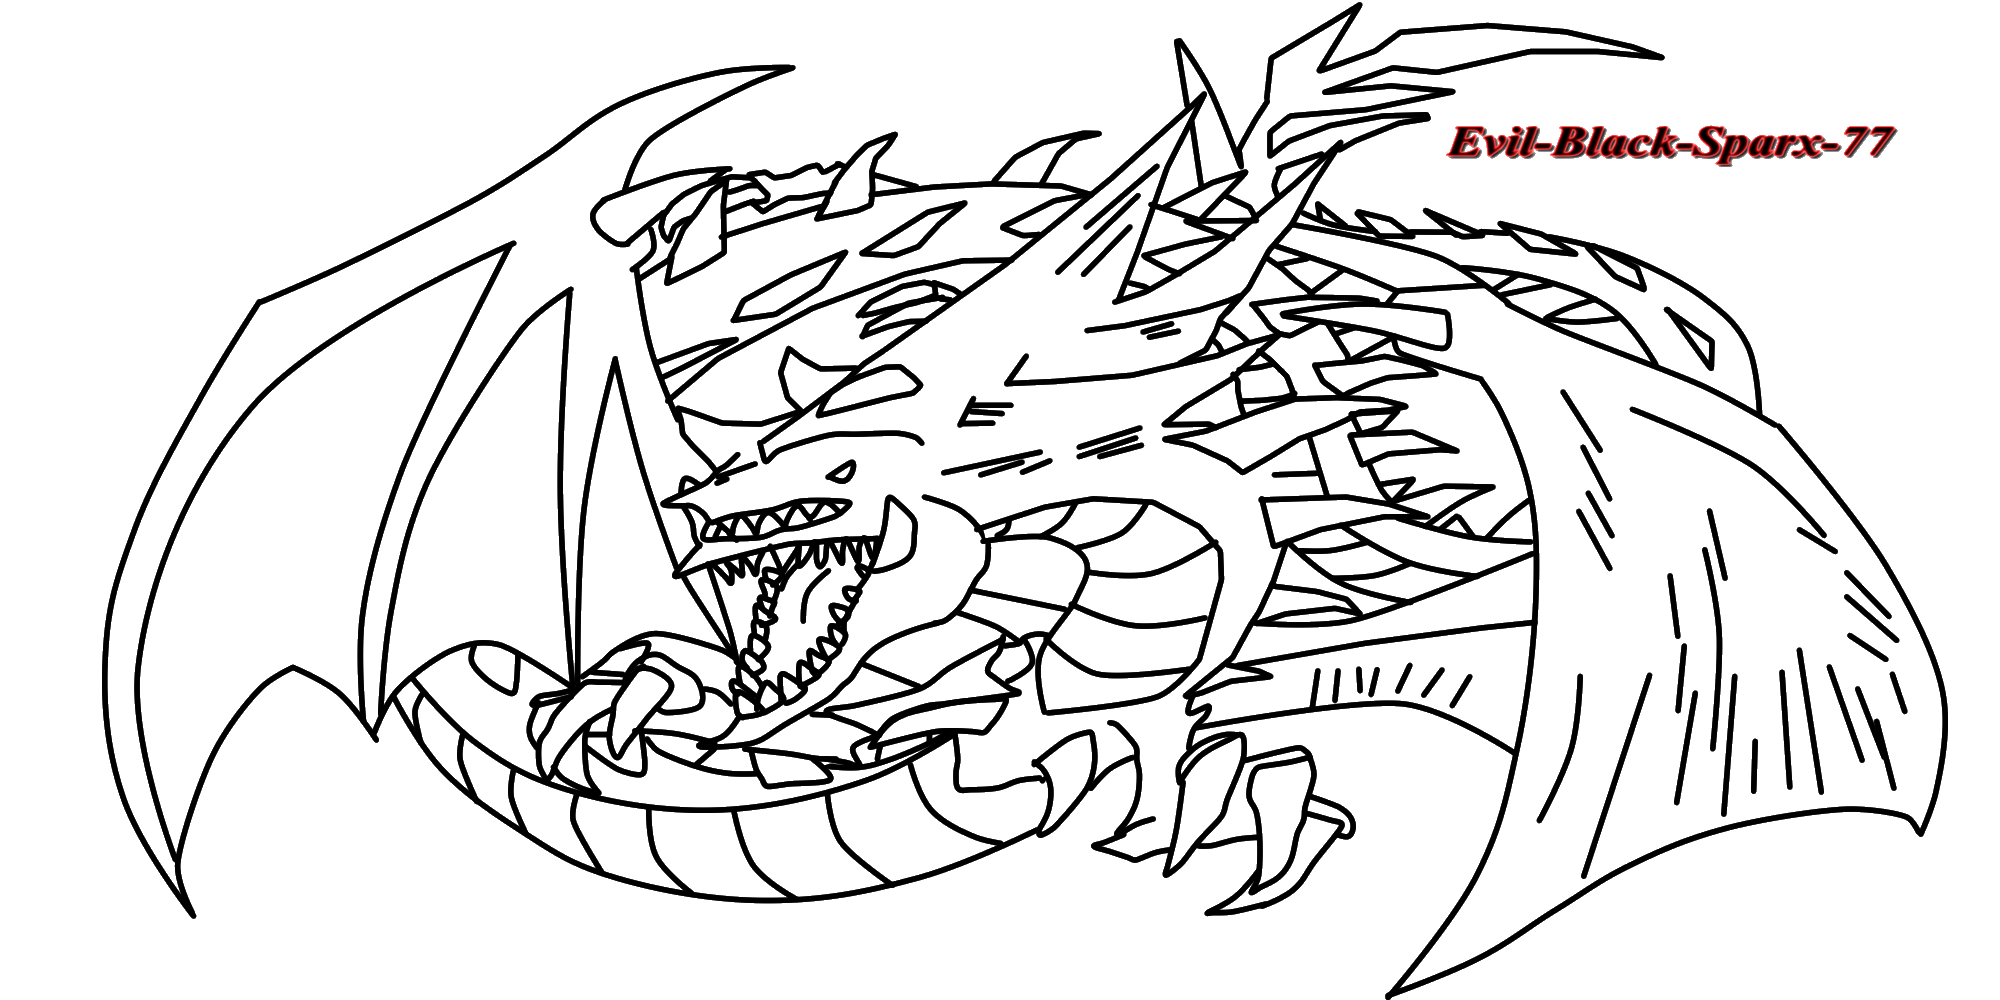 Slifer The Sky Dragon Lineart By Evil Black Sparx 77